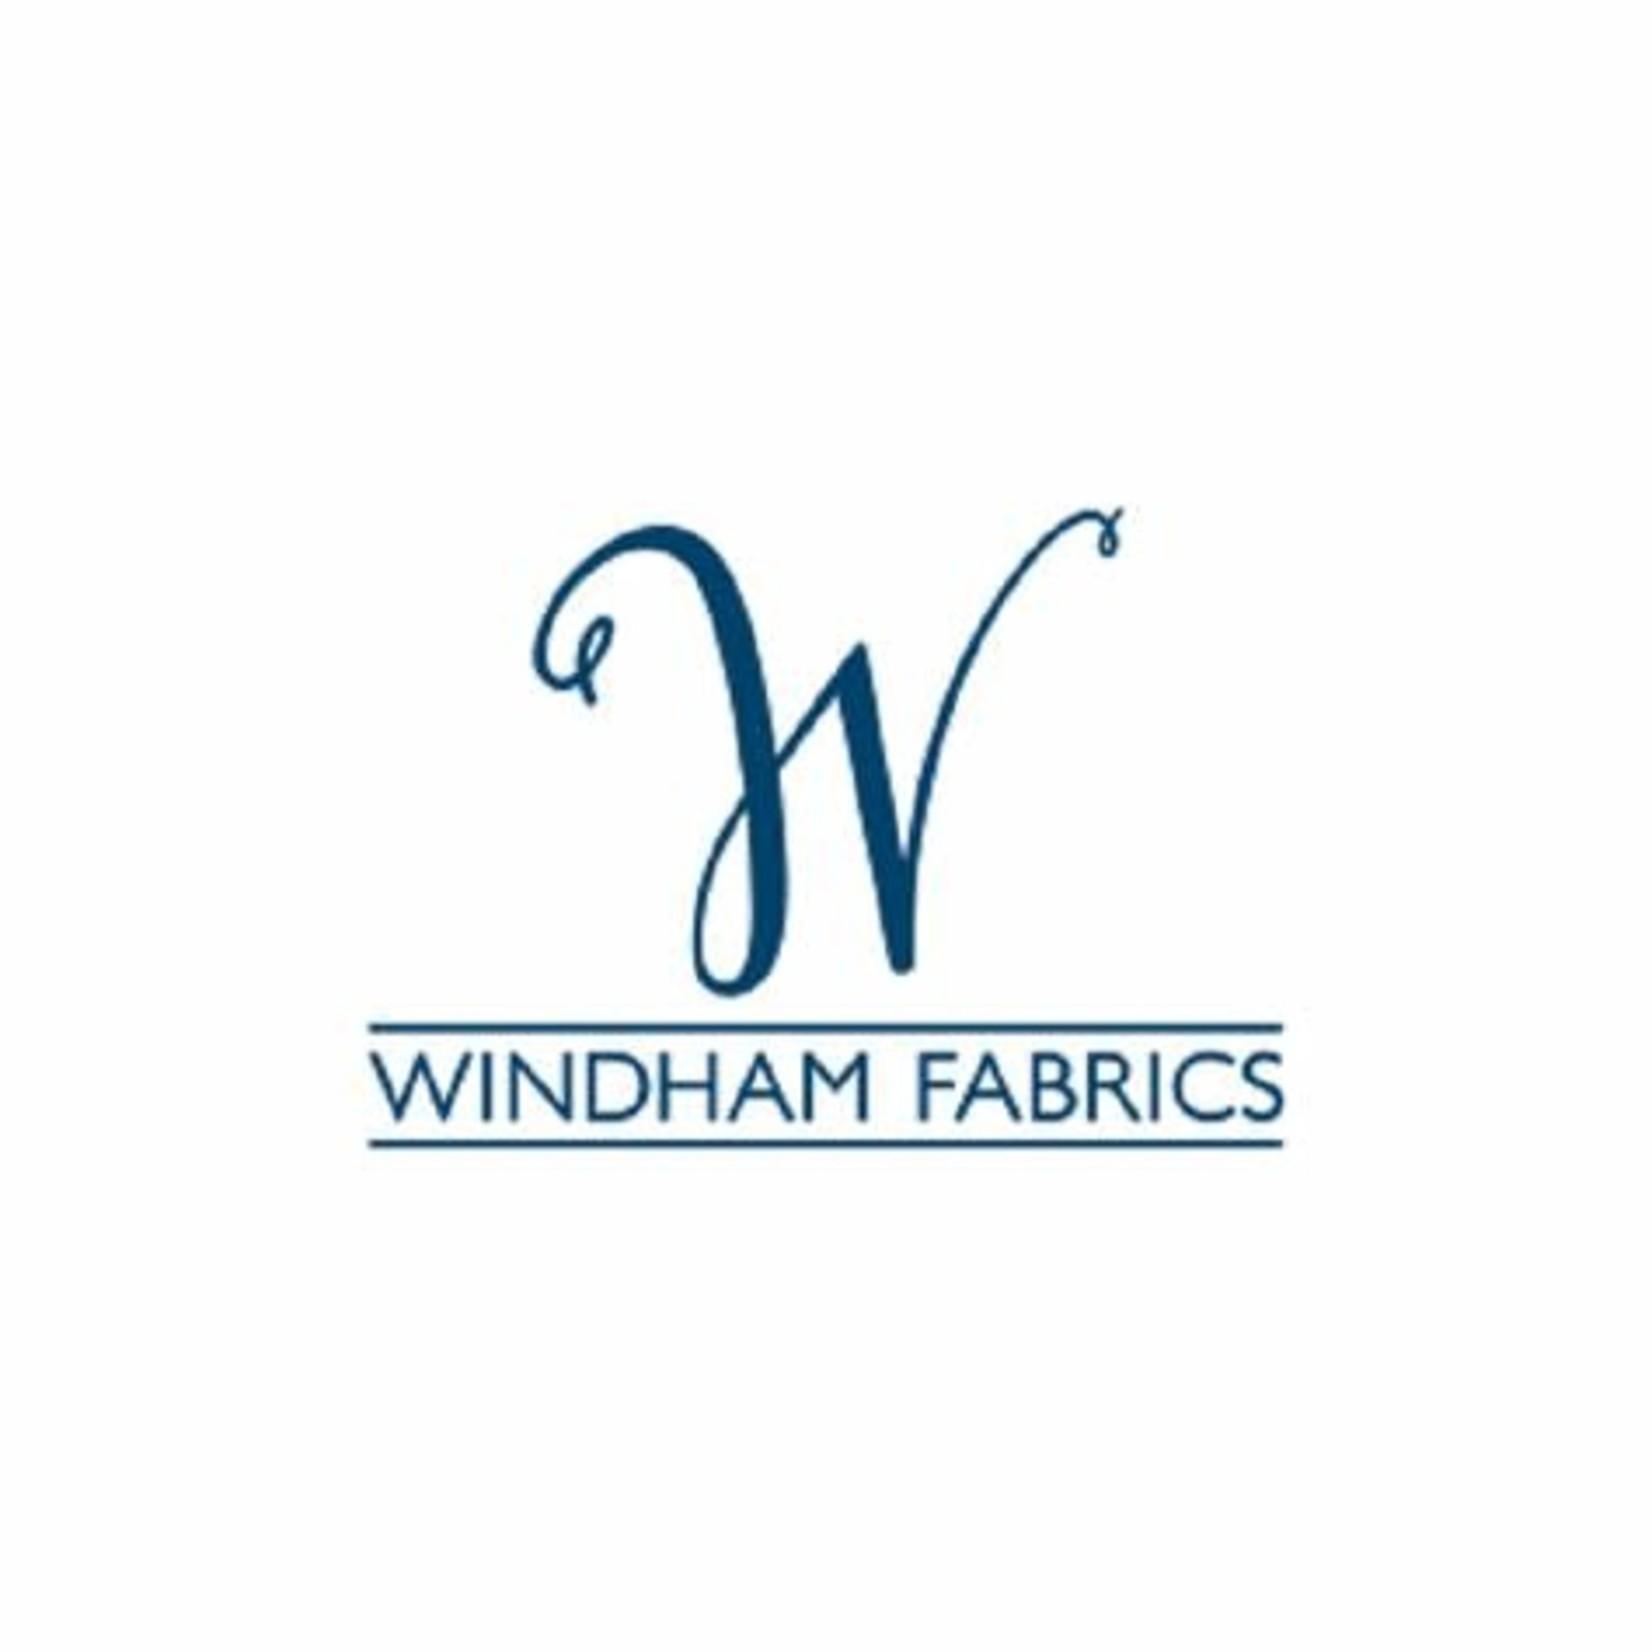 Windham Fabrics Midsummer - Meadow Ditsy - Silver